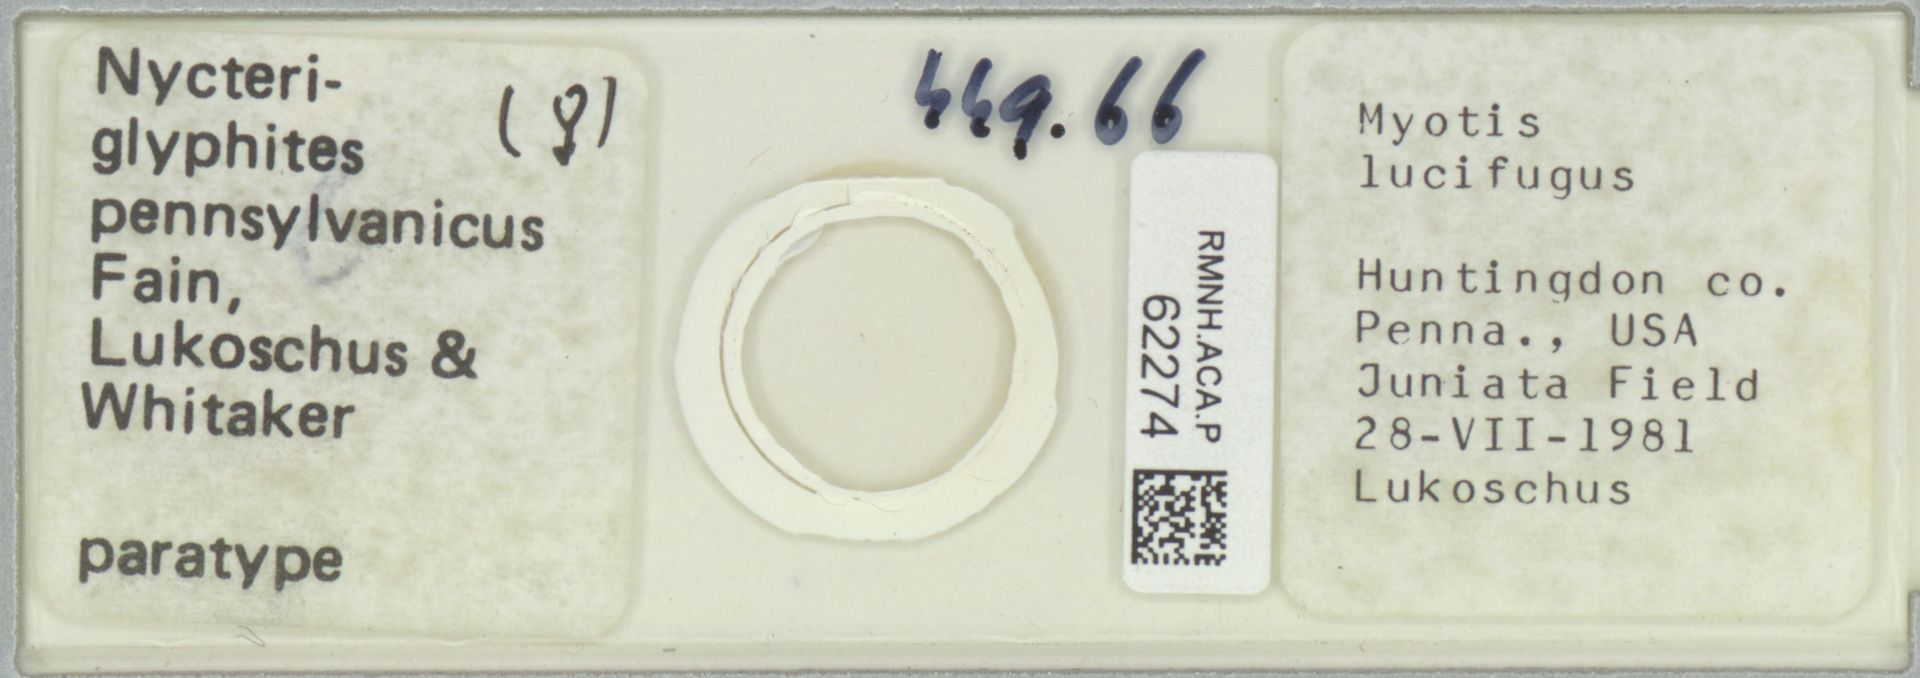 RMNH.ACA.P.62274 | Nycteriglyphites pennsylvanicus Fain, Lukoschus & Whitaker